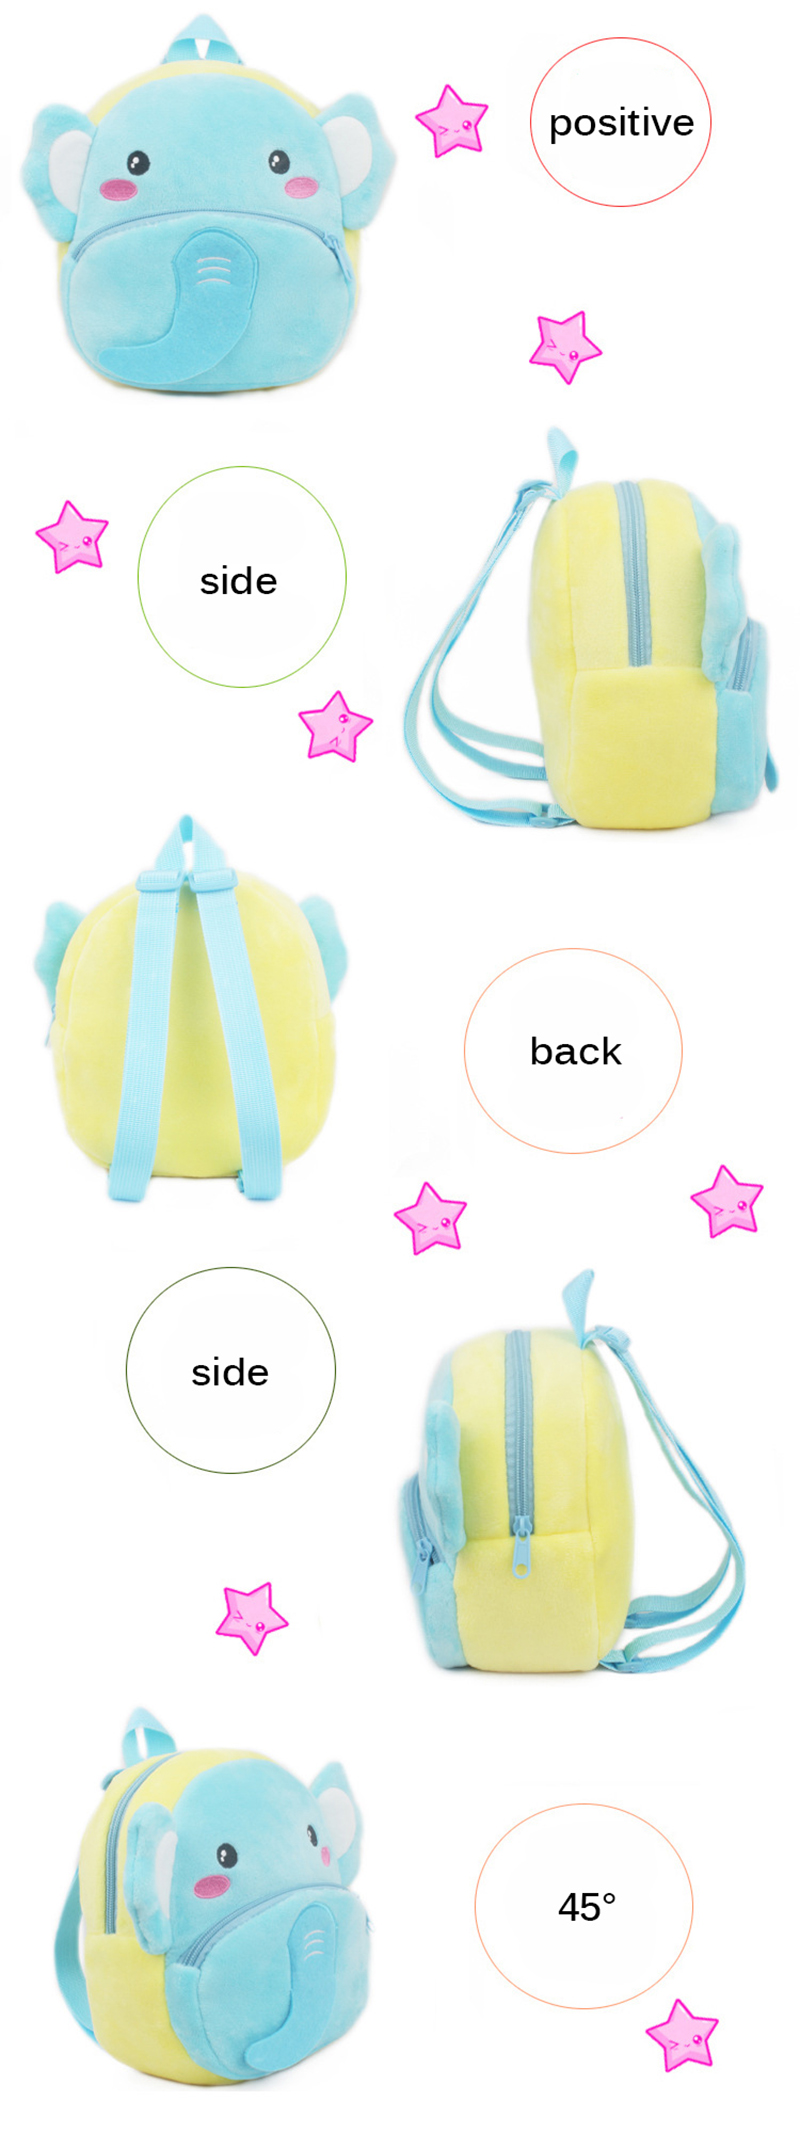 Kids Plush Backpack Cute Cartoon Zoo Animals School Bag Kindergarten Baby Panda Rabbit Unicorn Plush Bag for Boys Girls Bag Toy (3)